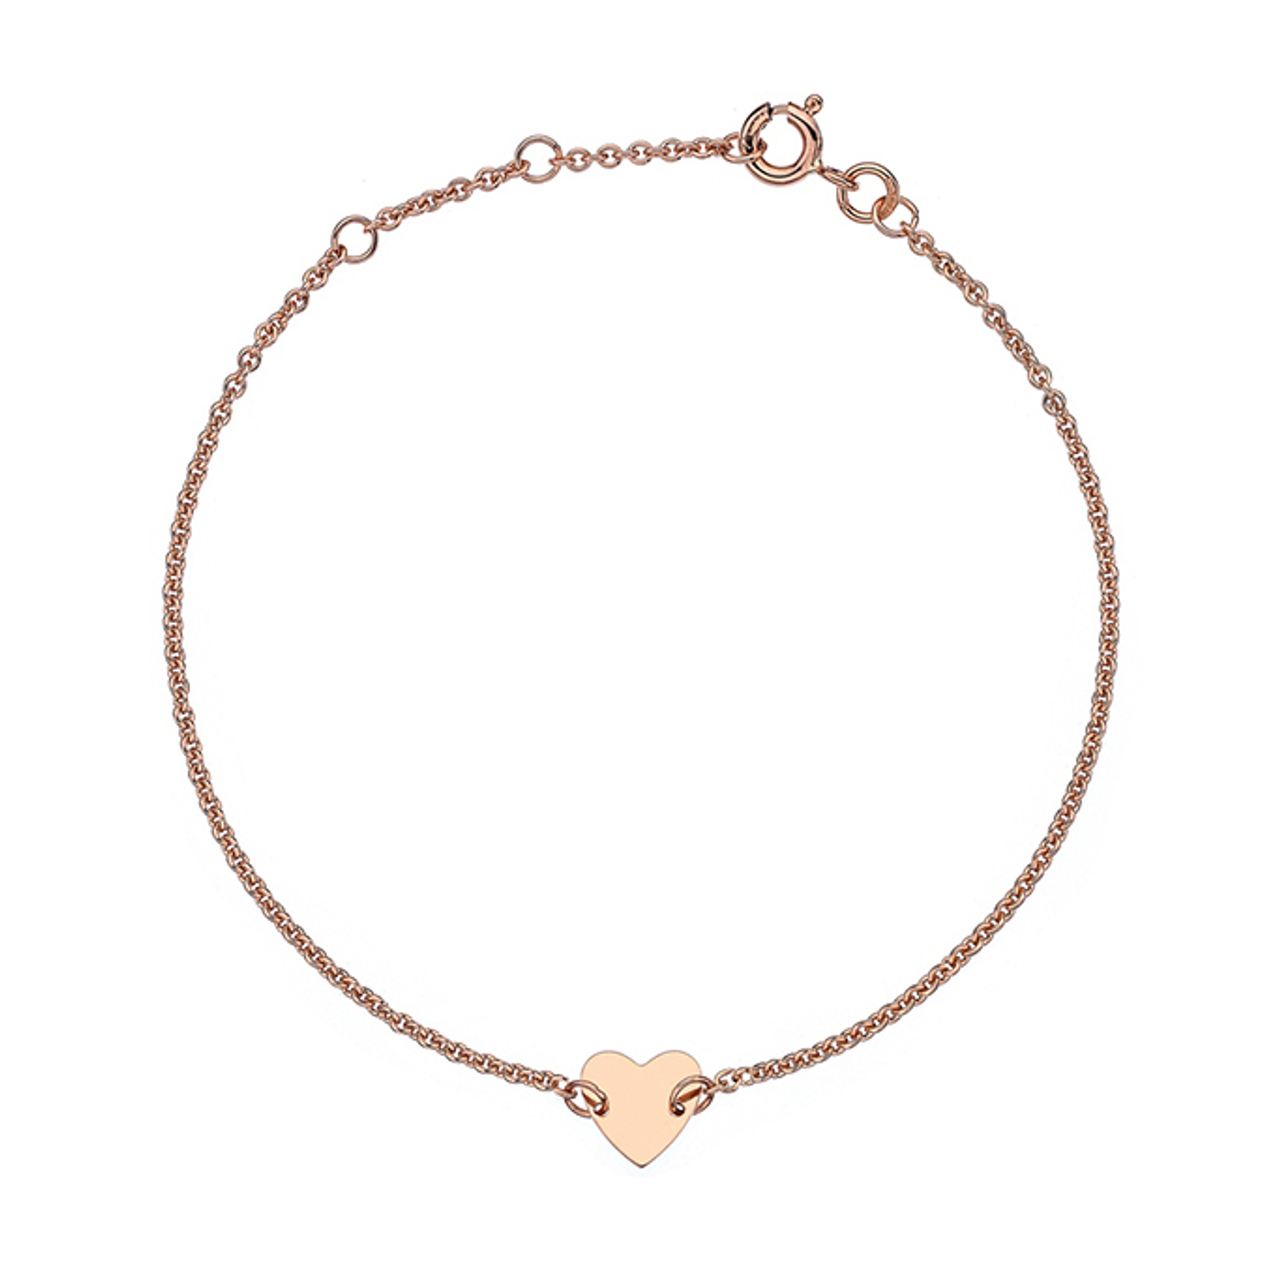 9ct Rose Gold heart Bracelet